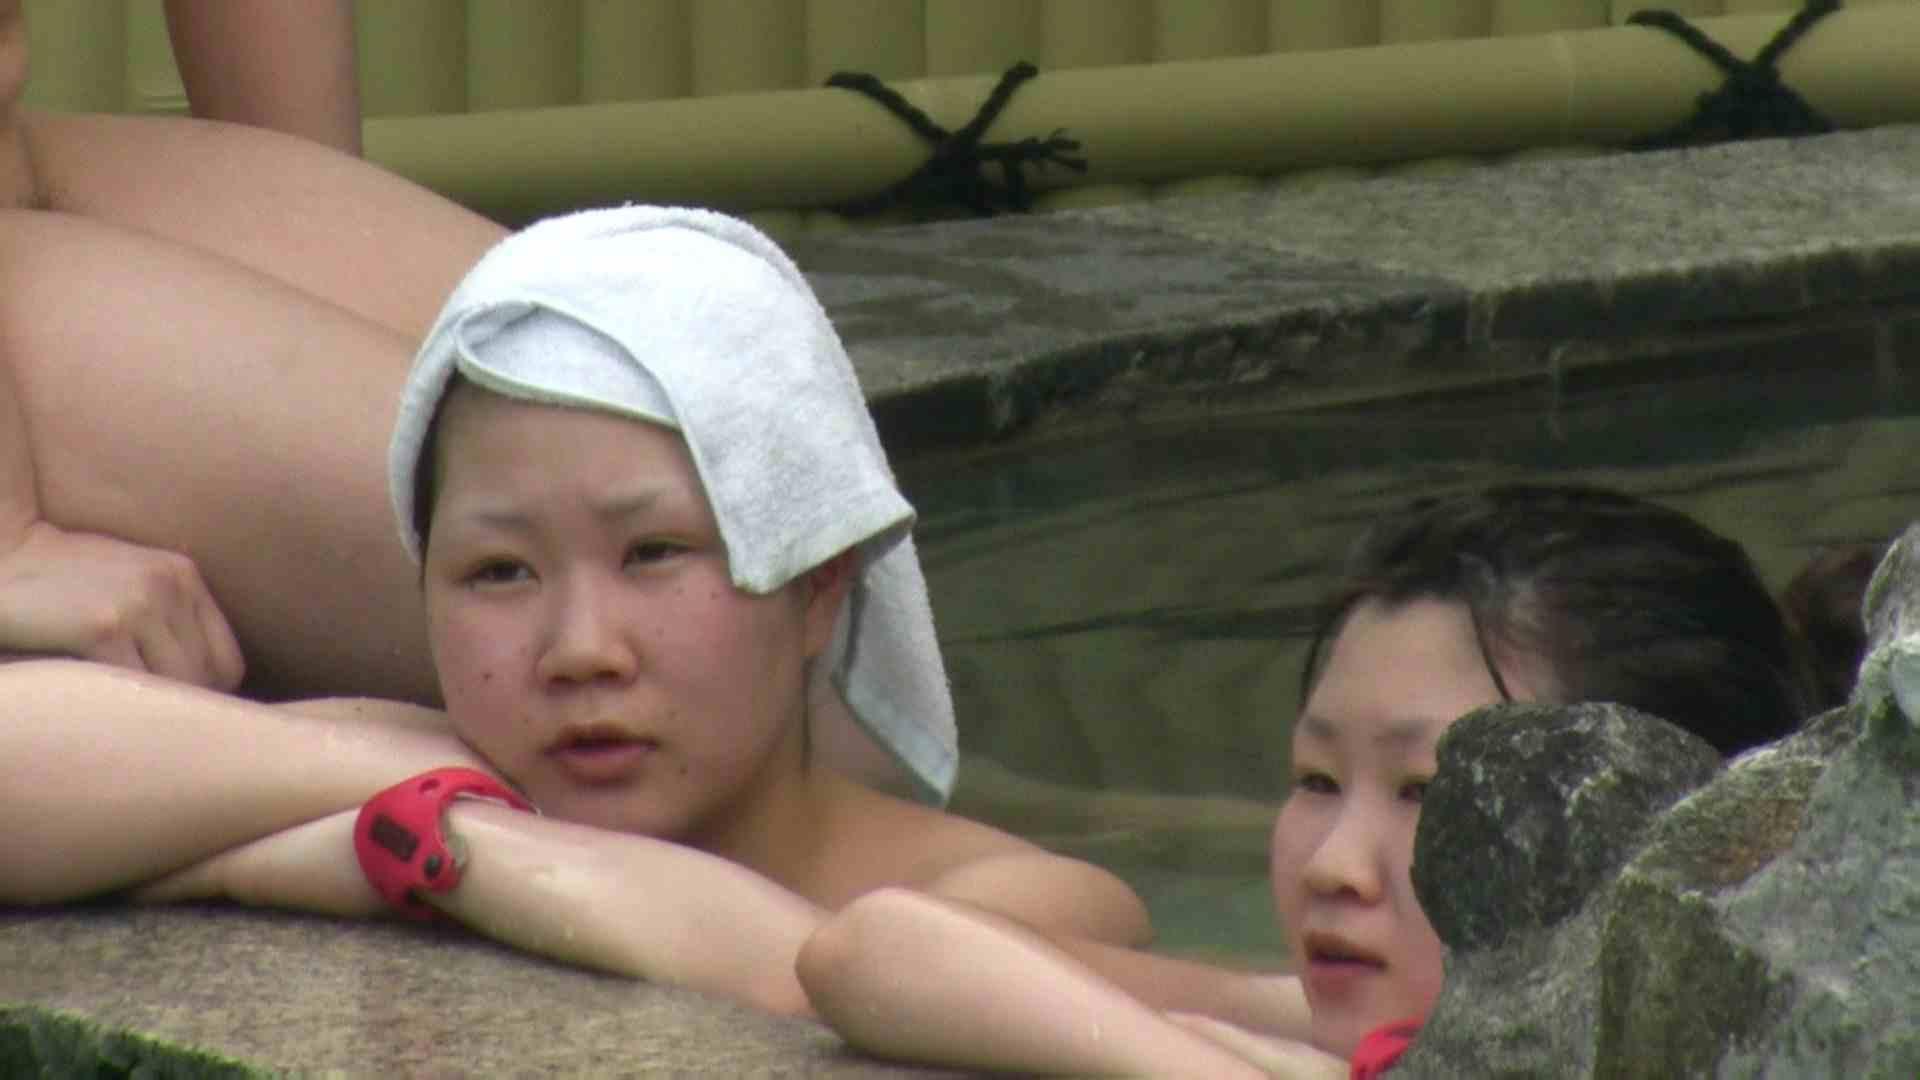 Aquaな露天風呂Vol.03【VIP】 OLセックス  94画像 33